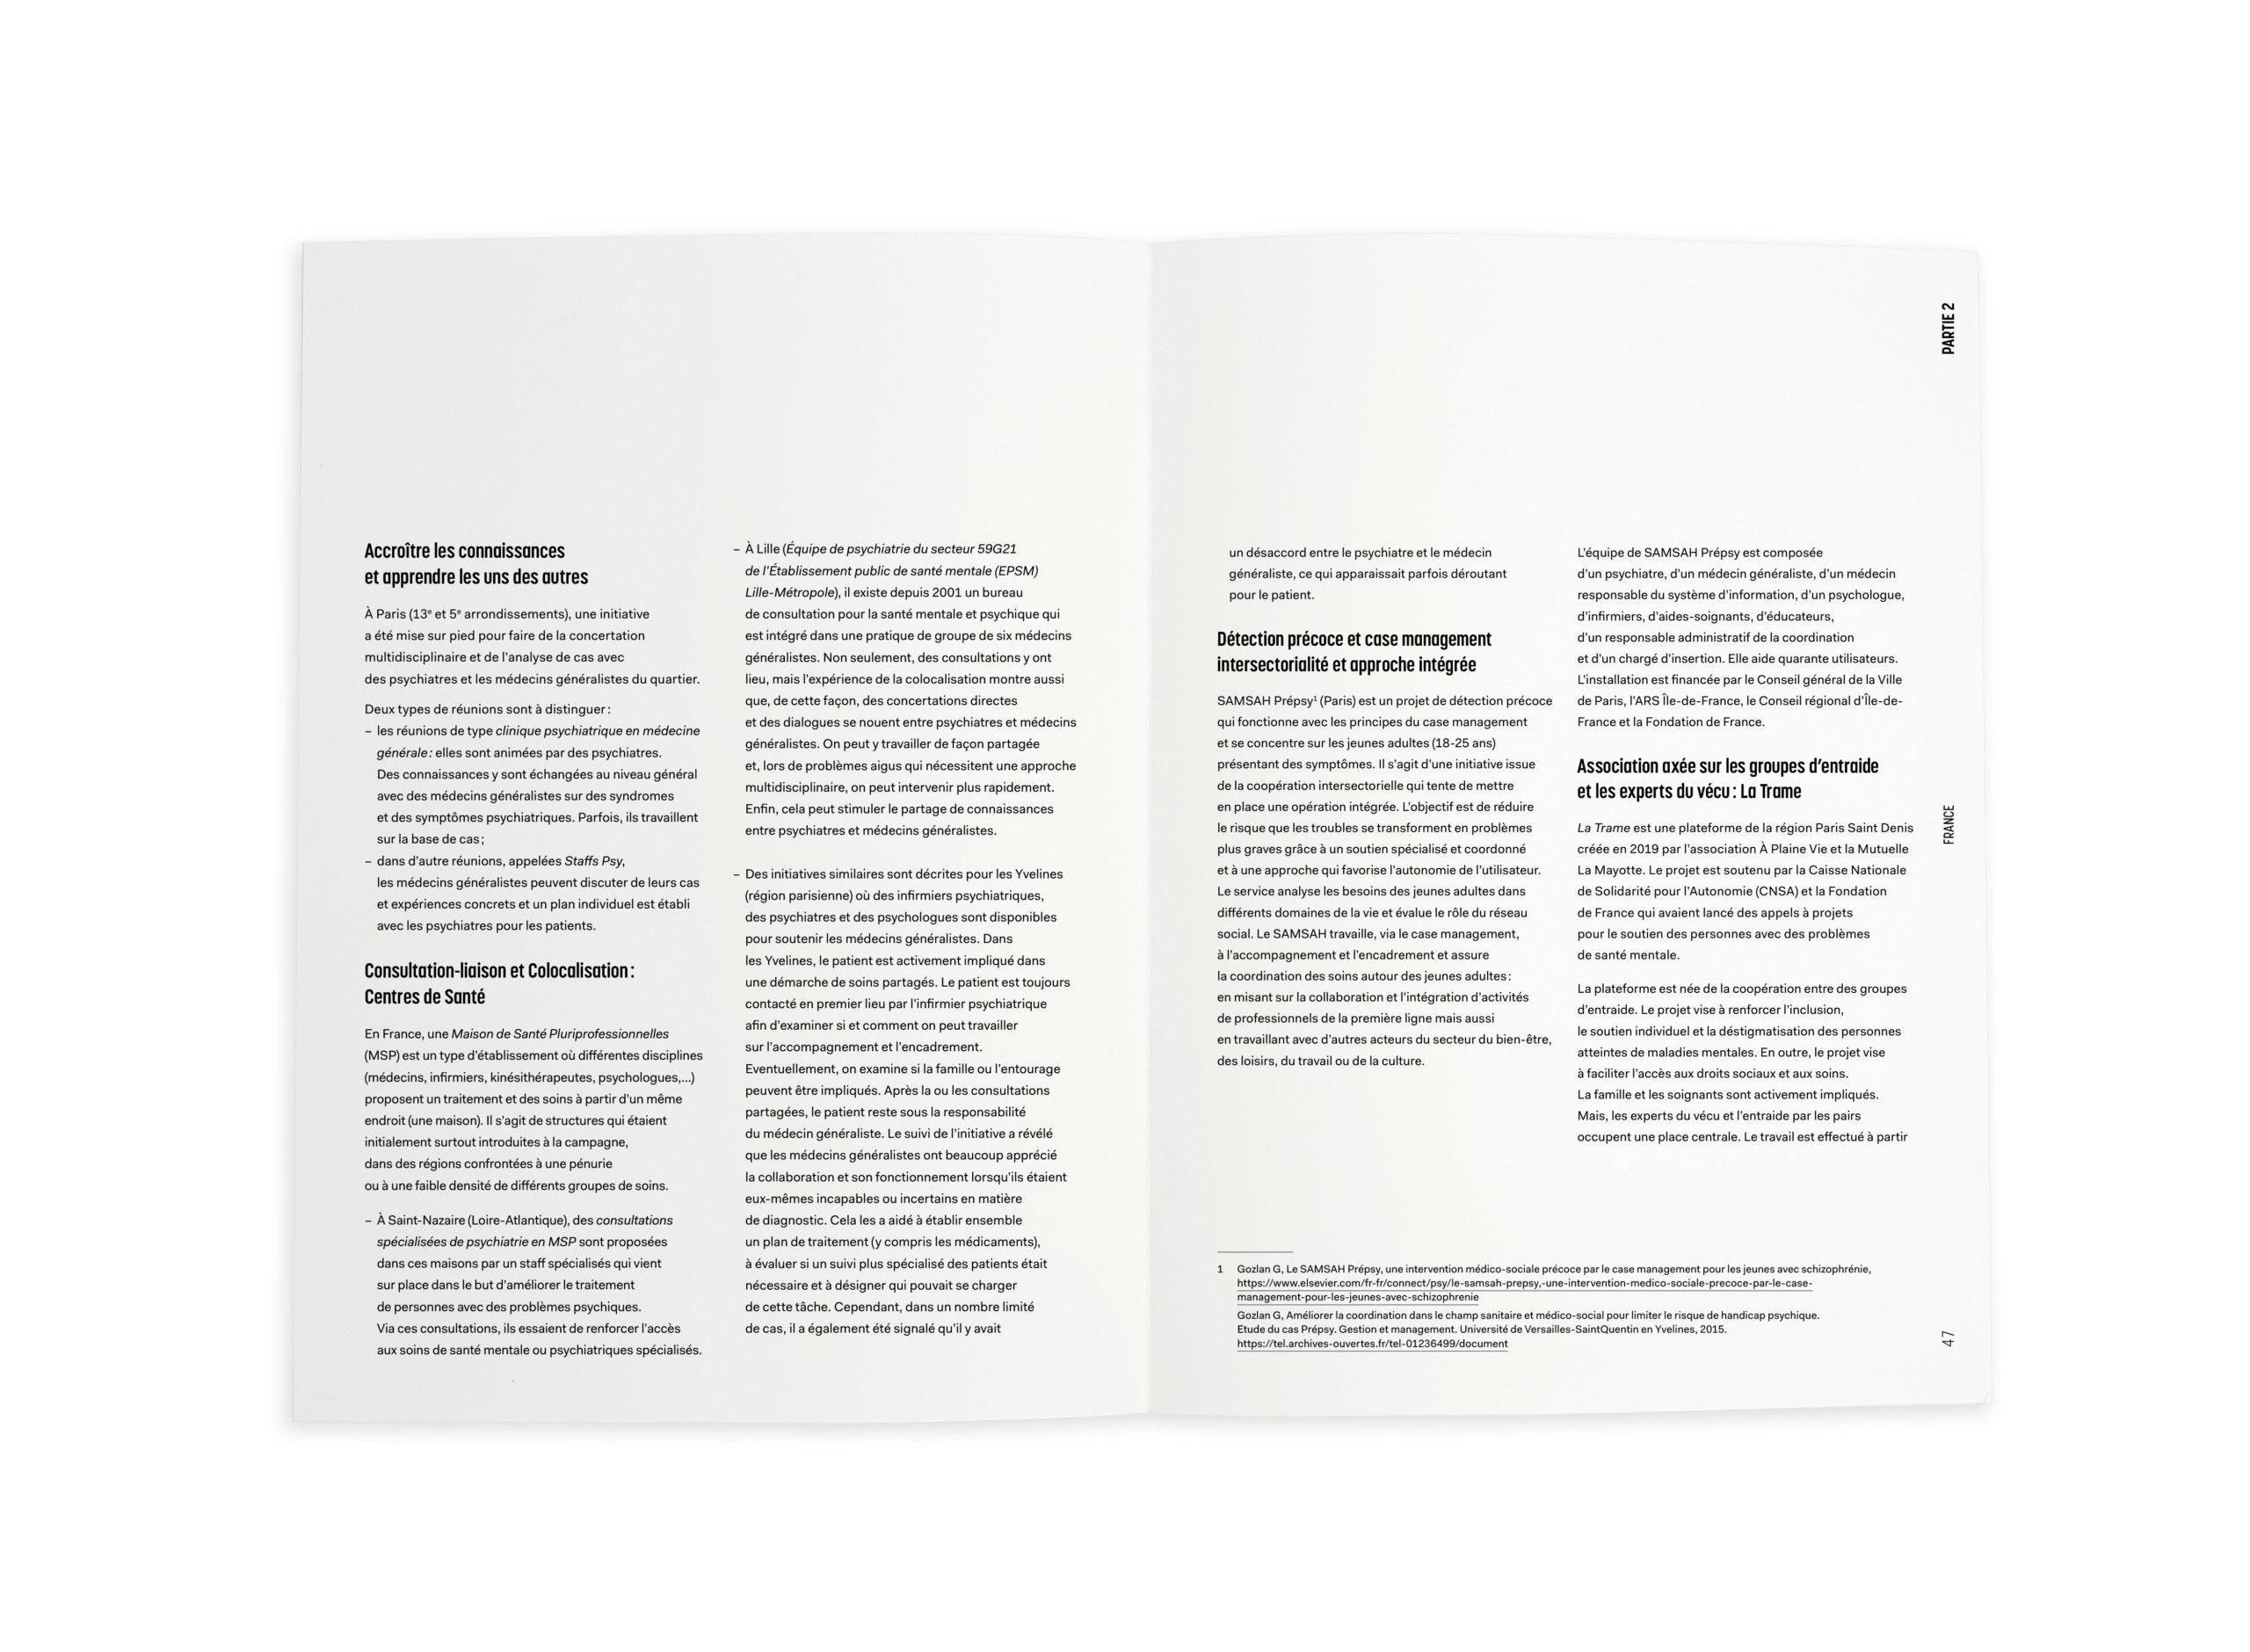 FRB Sante Mentale Brochure 08